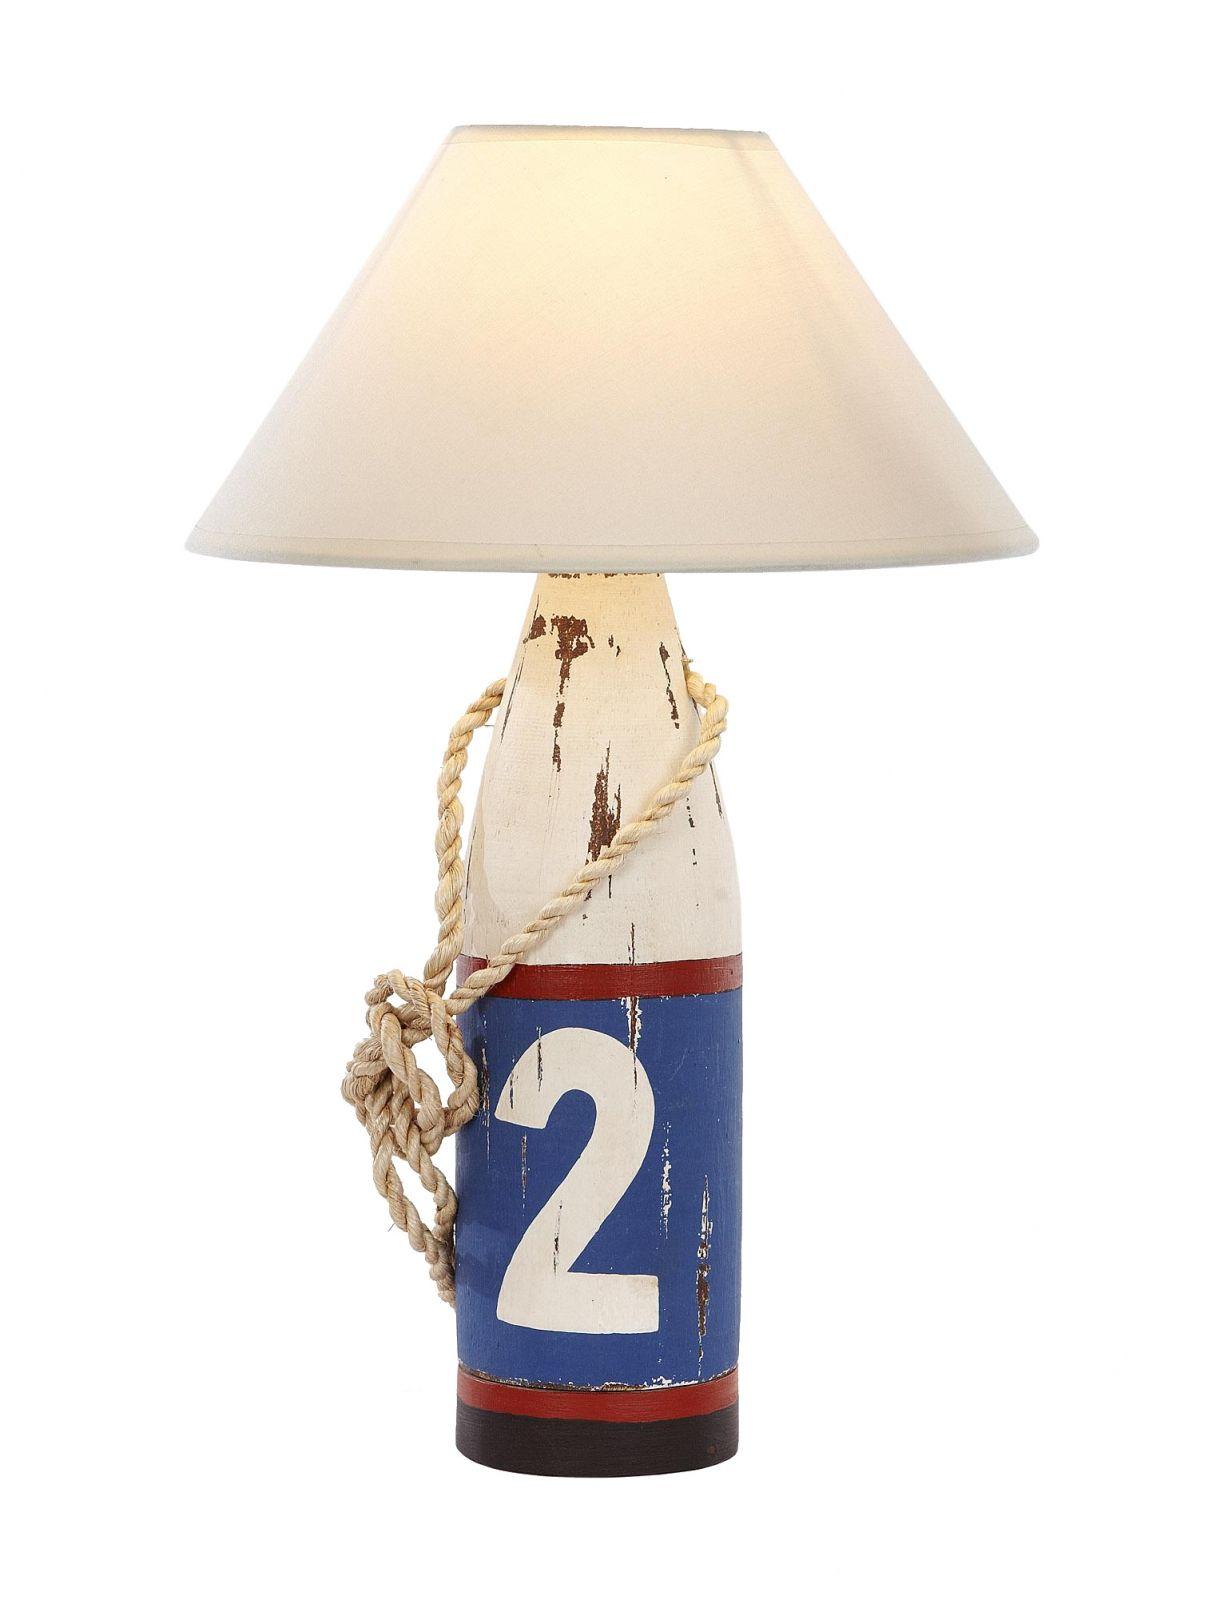 Lampe Holzboje 2 Weiss Blau Rot L Wood Pinterest Table Lamp